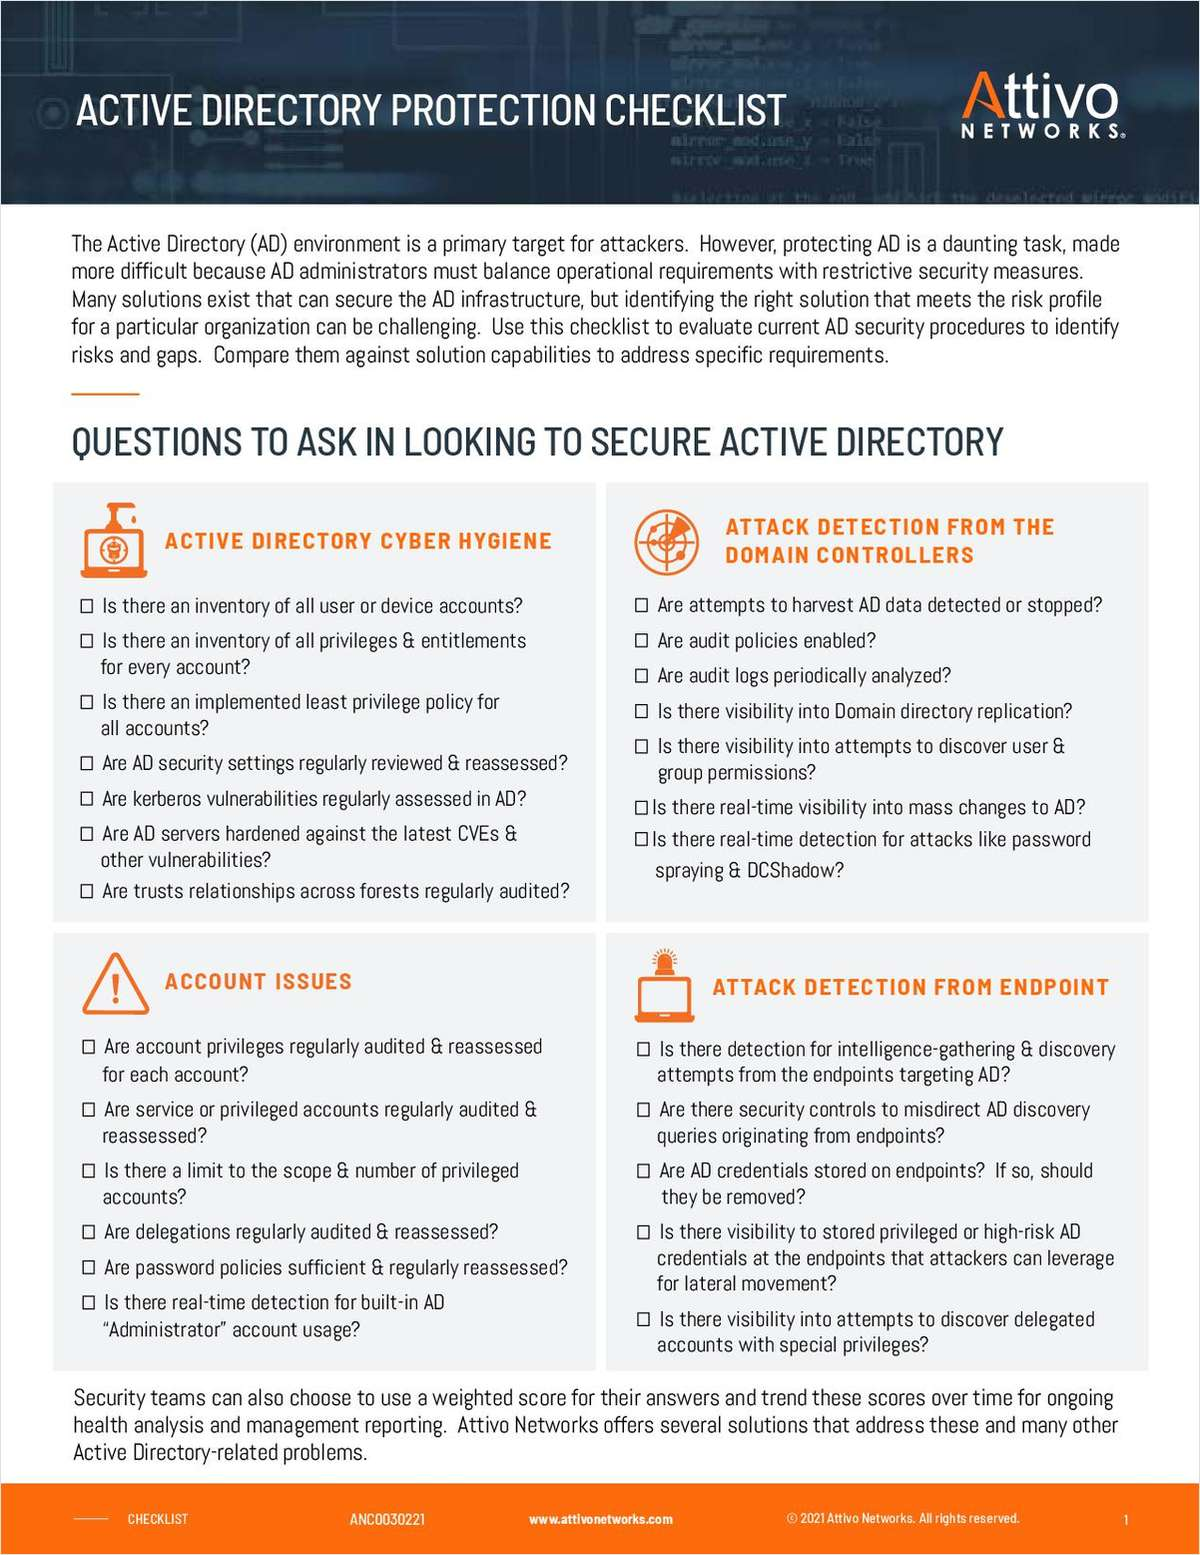 Active Directory Protection Checklist